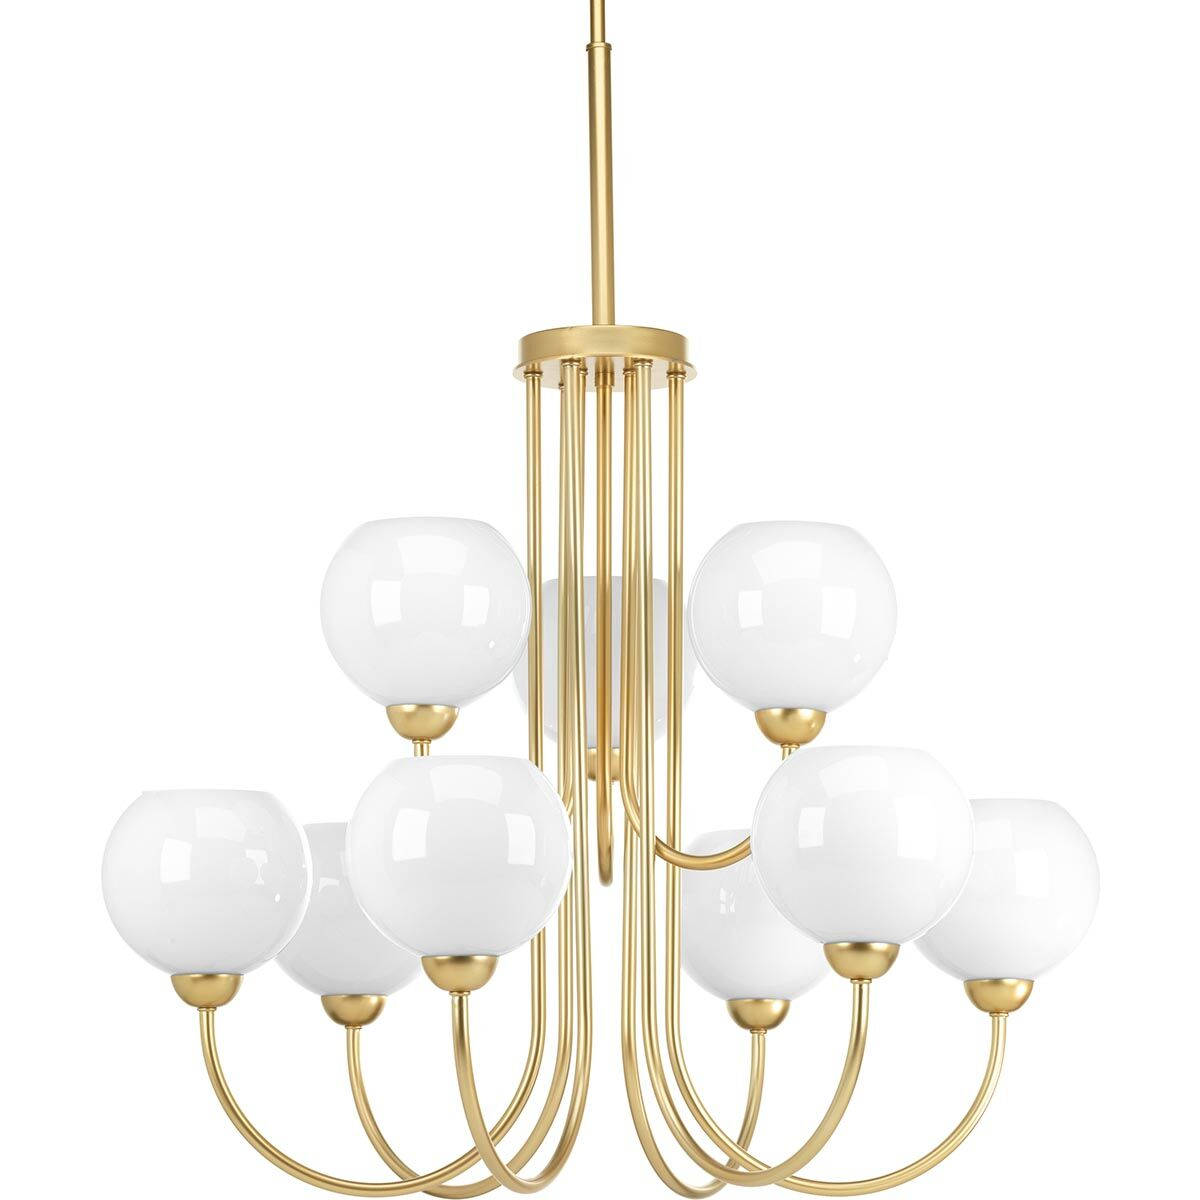 Jaina 9-Light Shaded Chandelier Finish: Vintage Gold